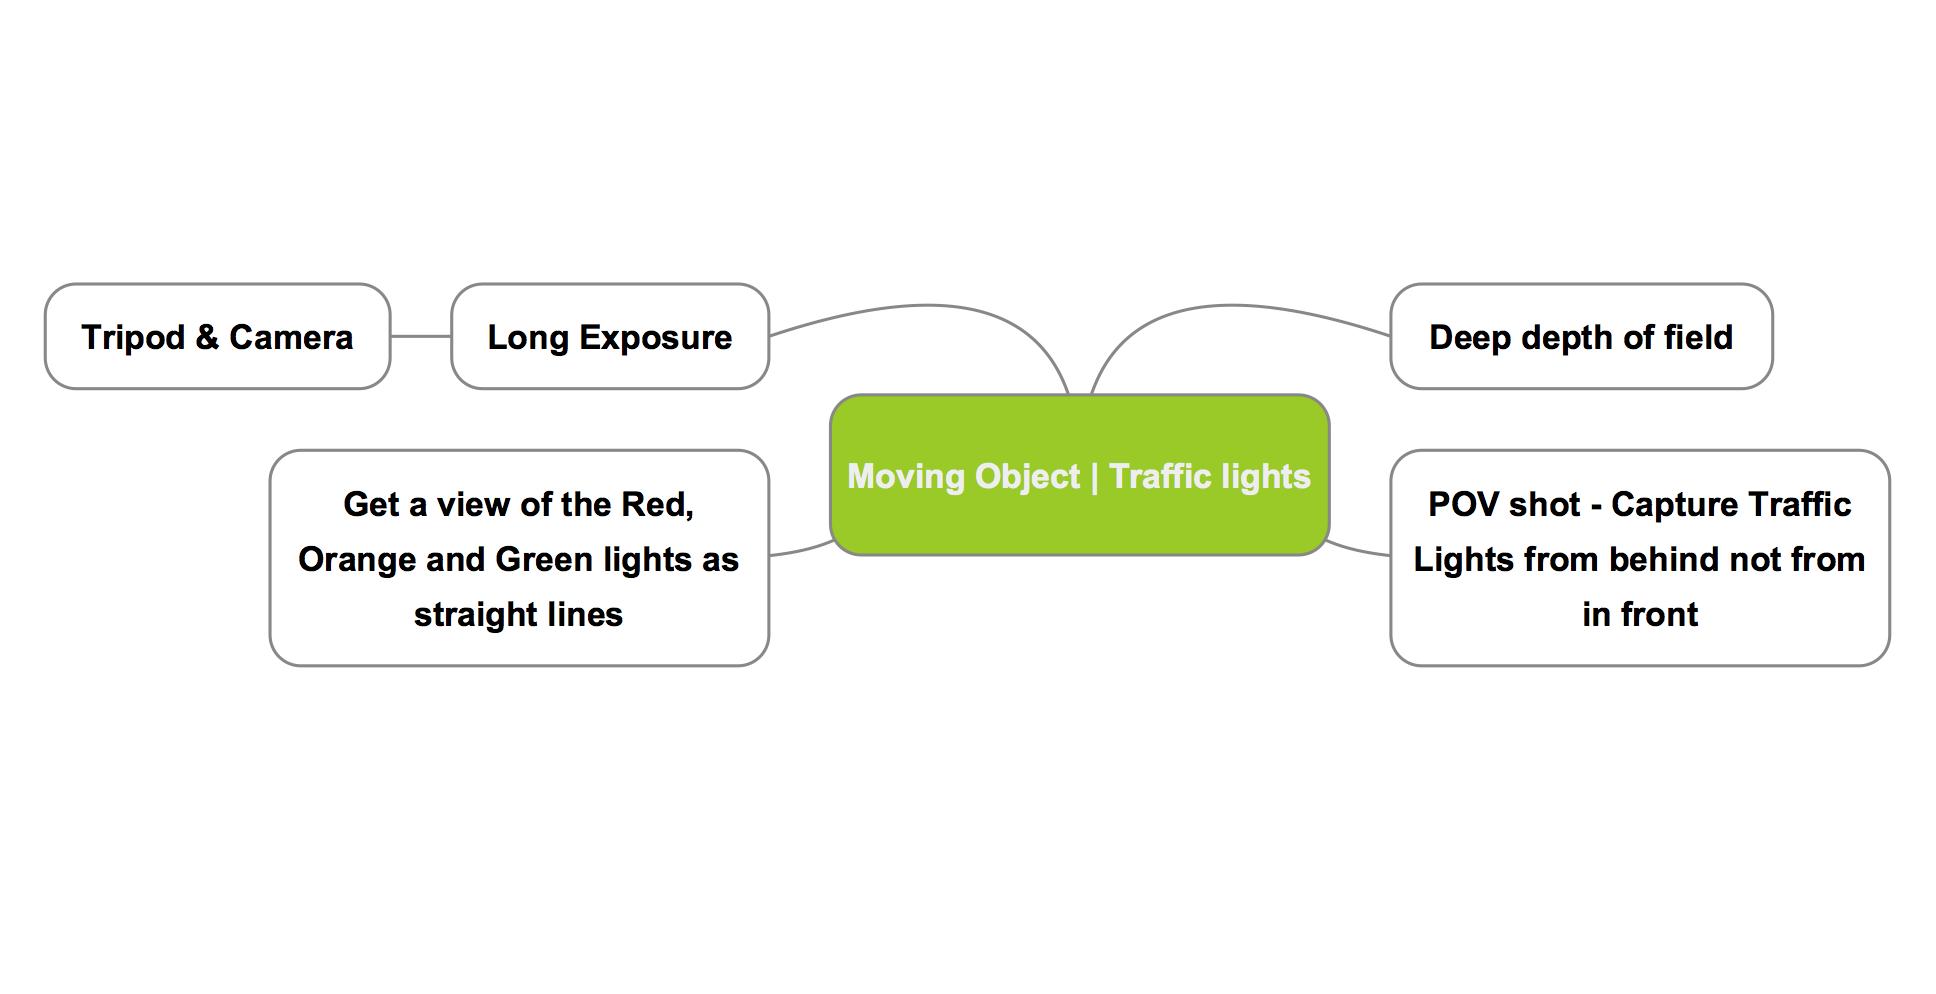 Mind map 3 - Traffic Lights - Long Exposure Photo | Long exposure